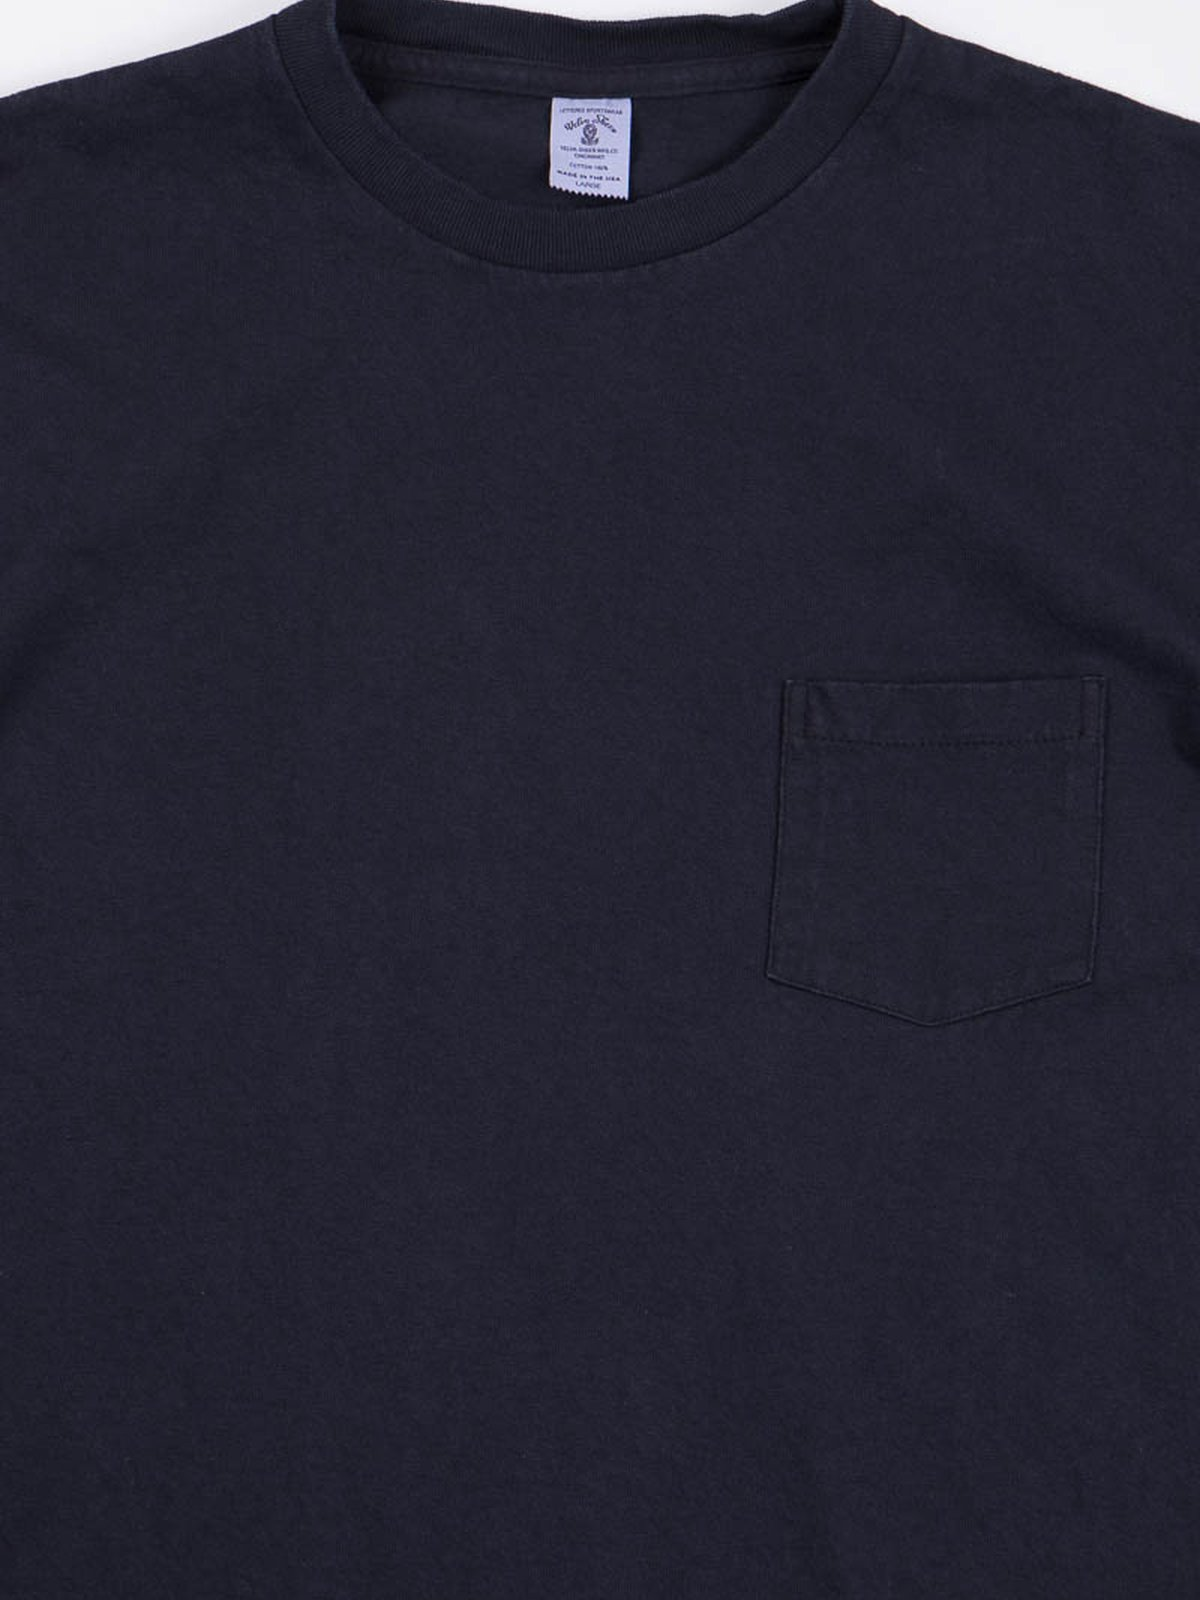 Black Indigo 1–Pac Pocket Tee - Image 3